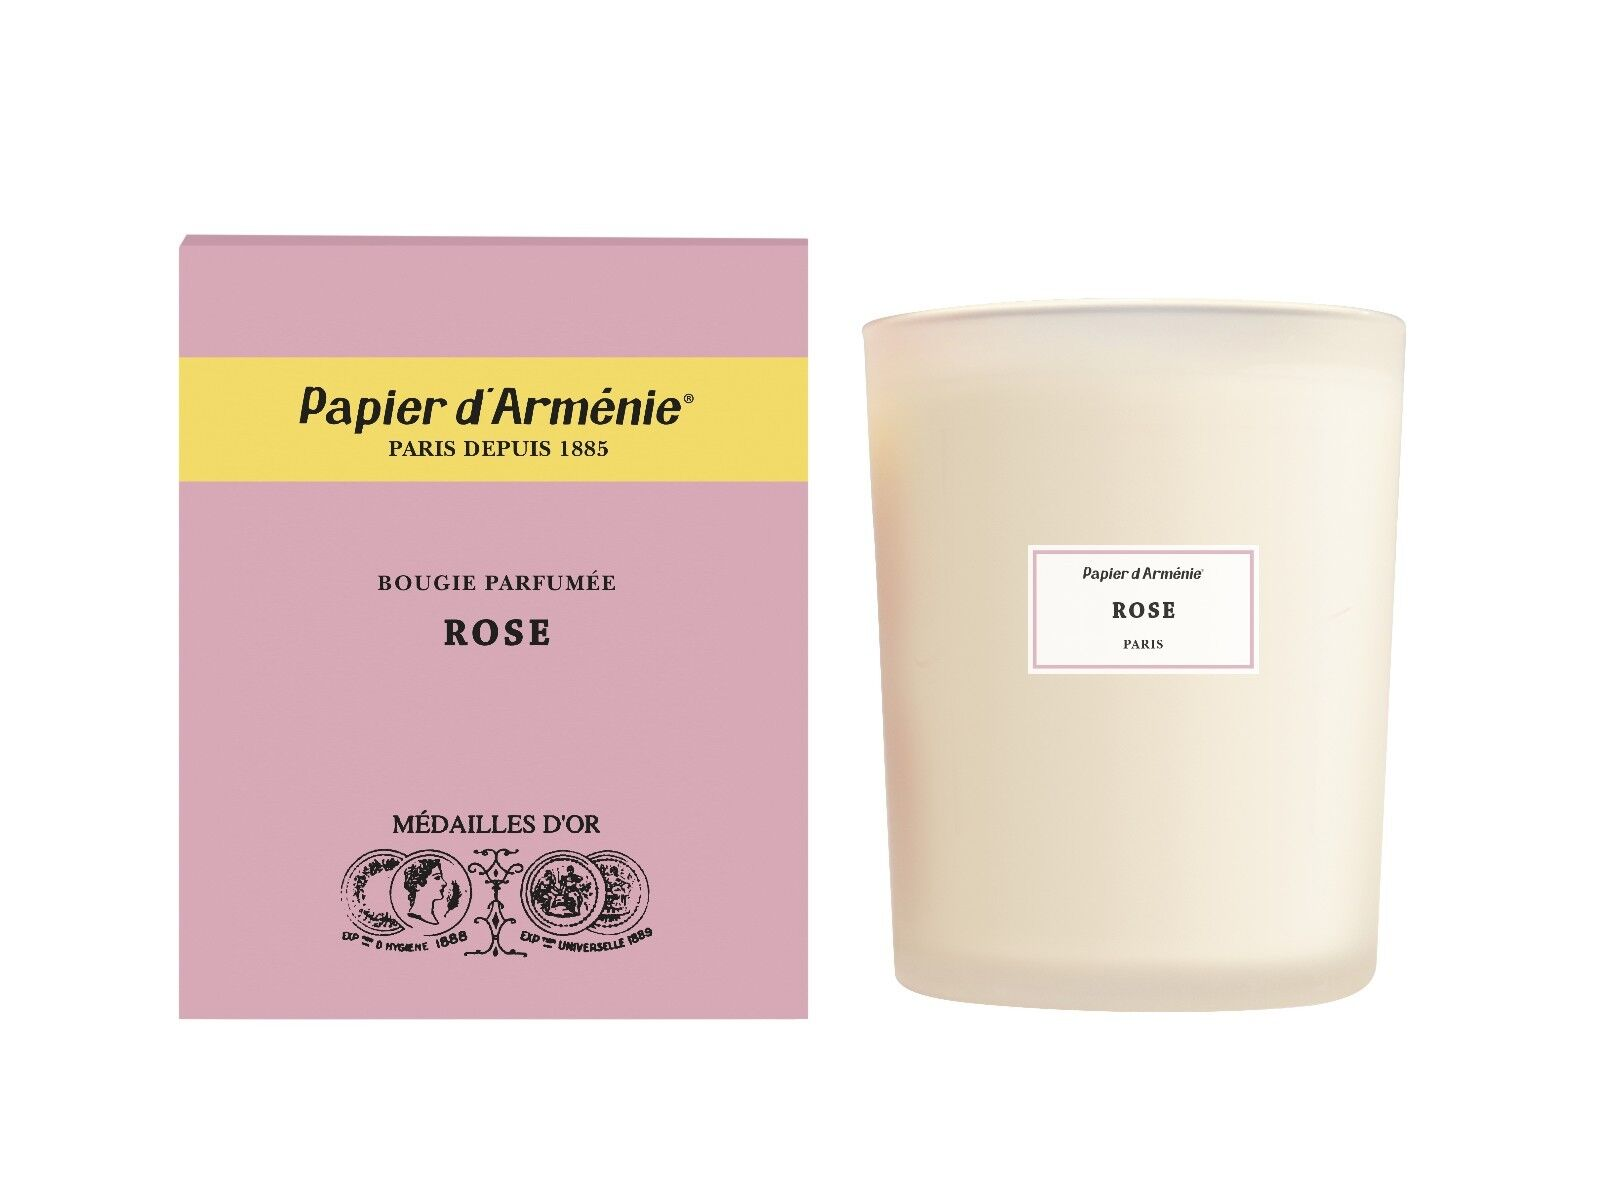 Papier d'Armenie, La pink  Fragrance Candle, A Francis Kurkdjian Collaboration